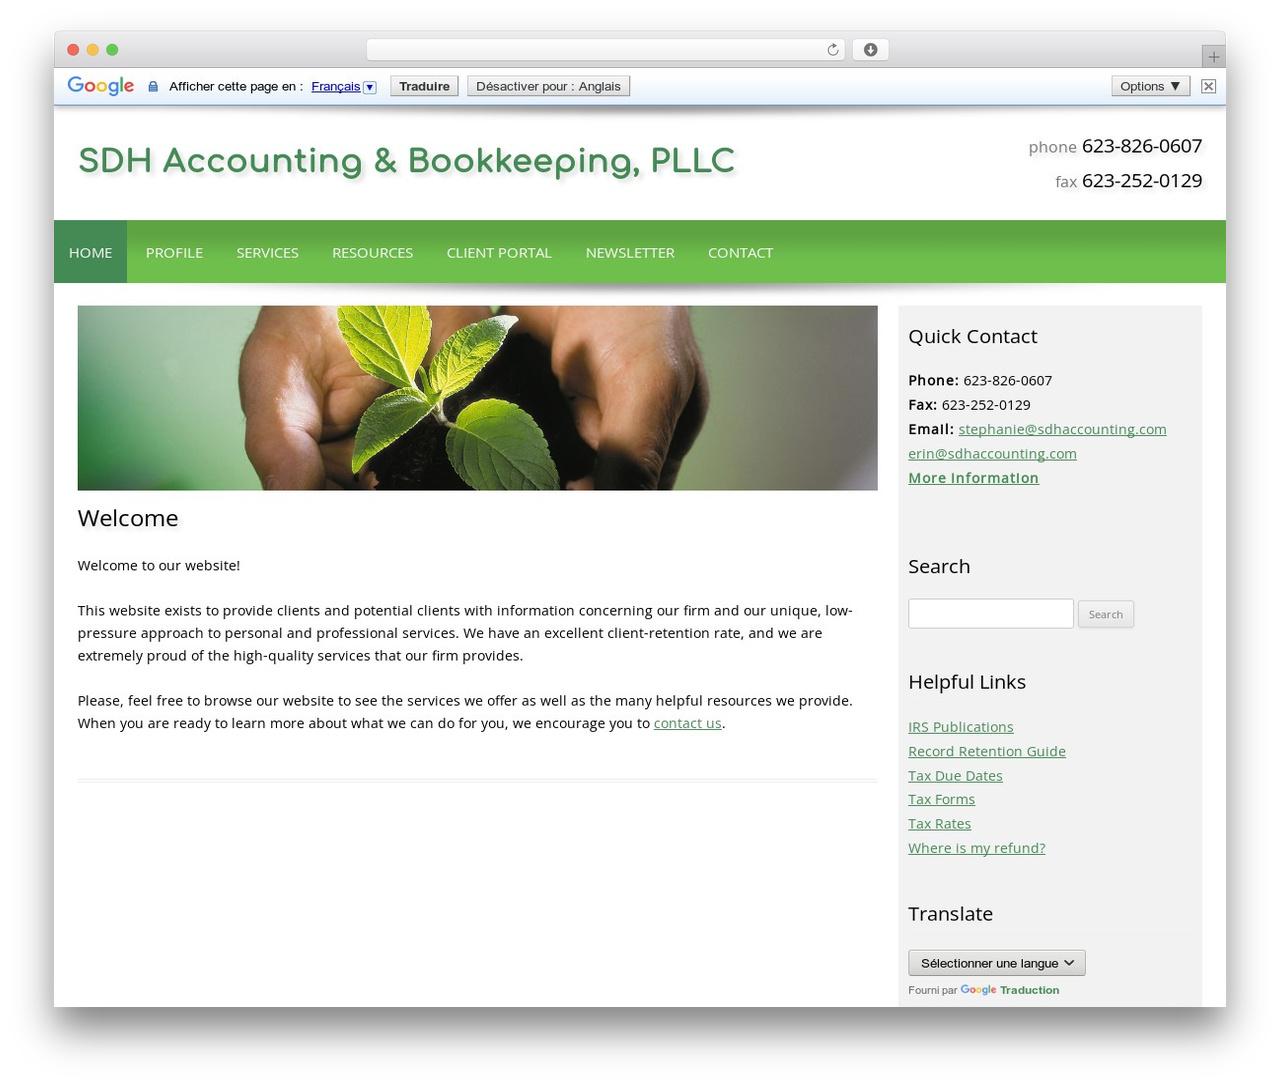 Customized WordPress theme design - sdhaccounting.com